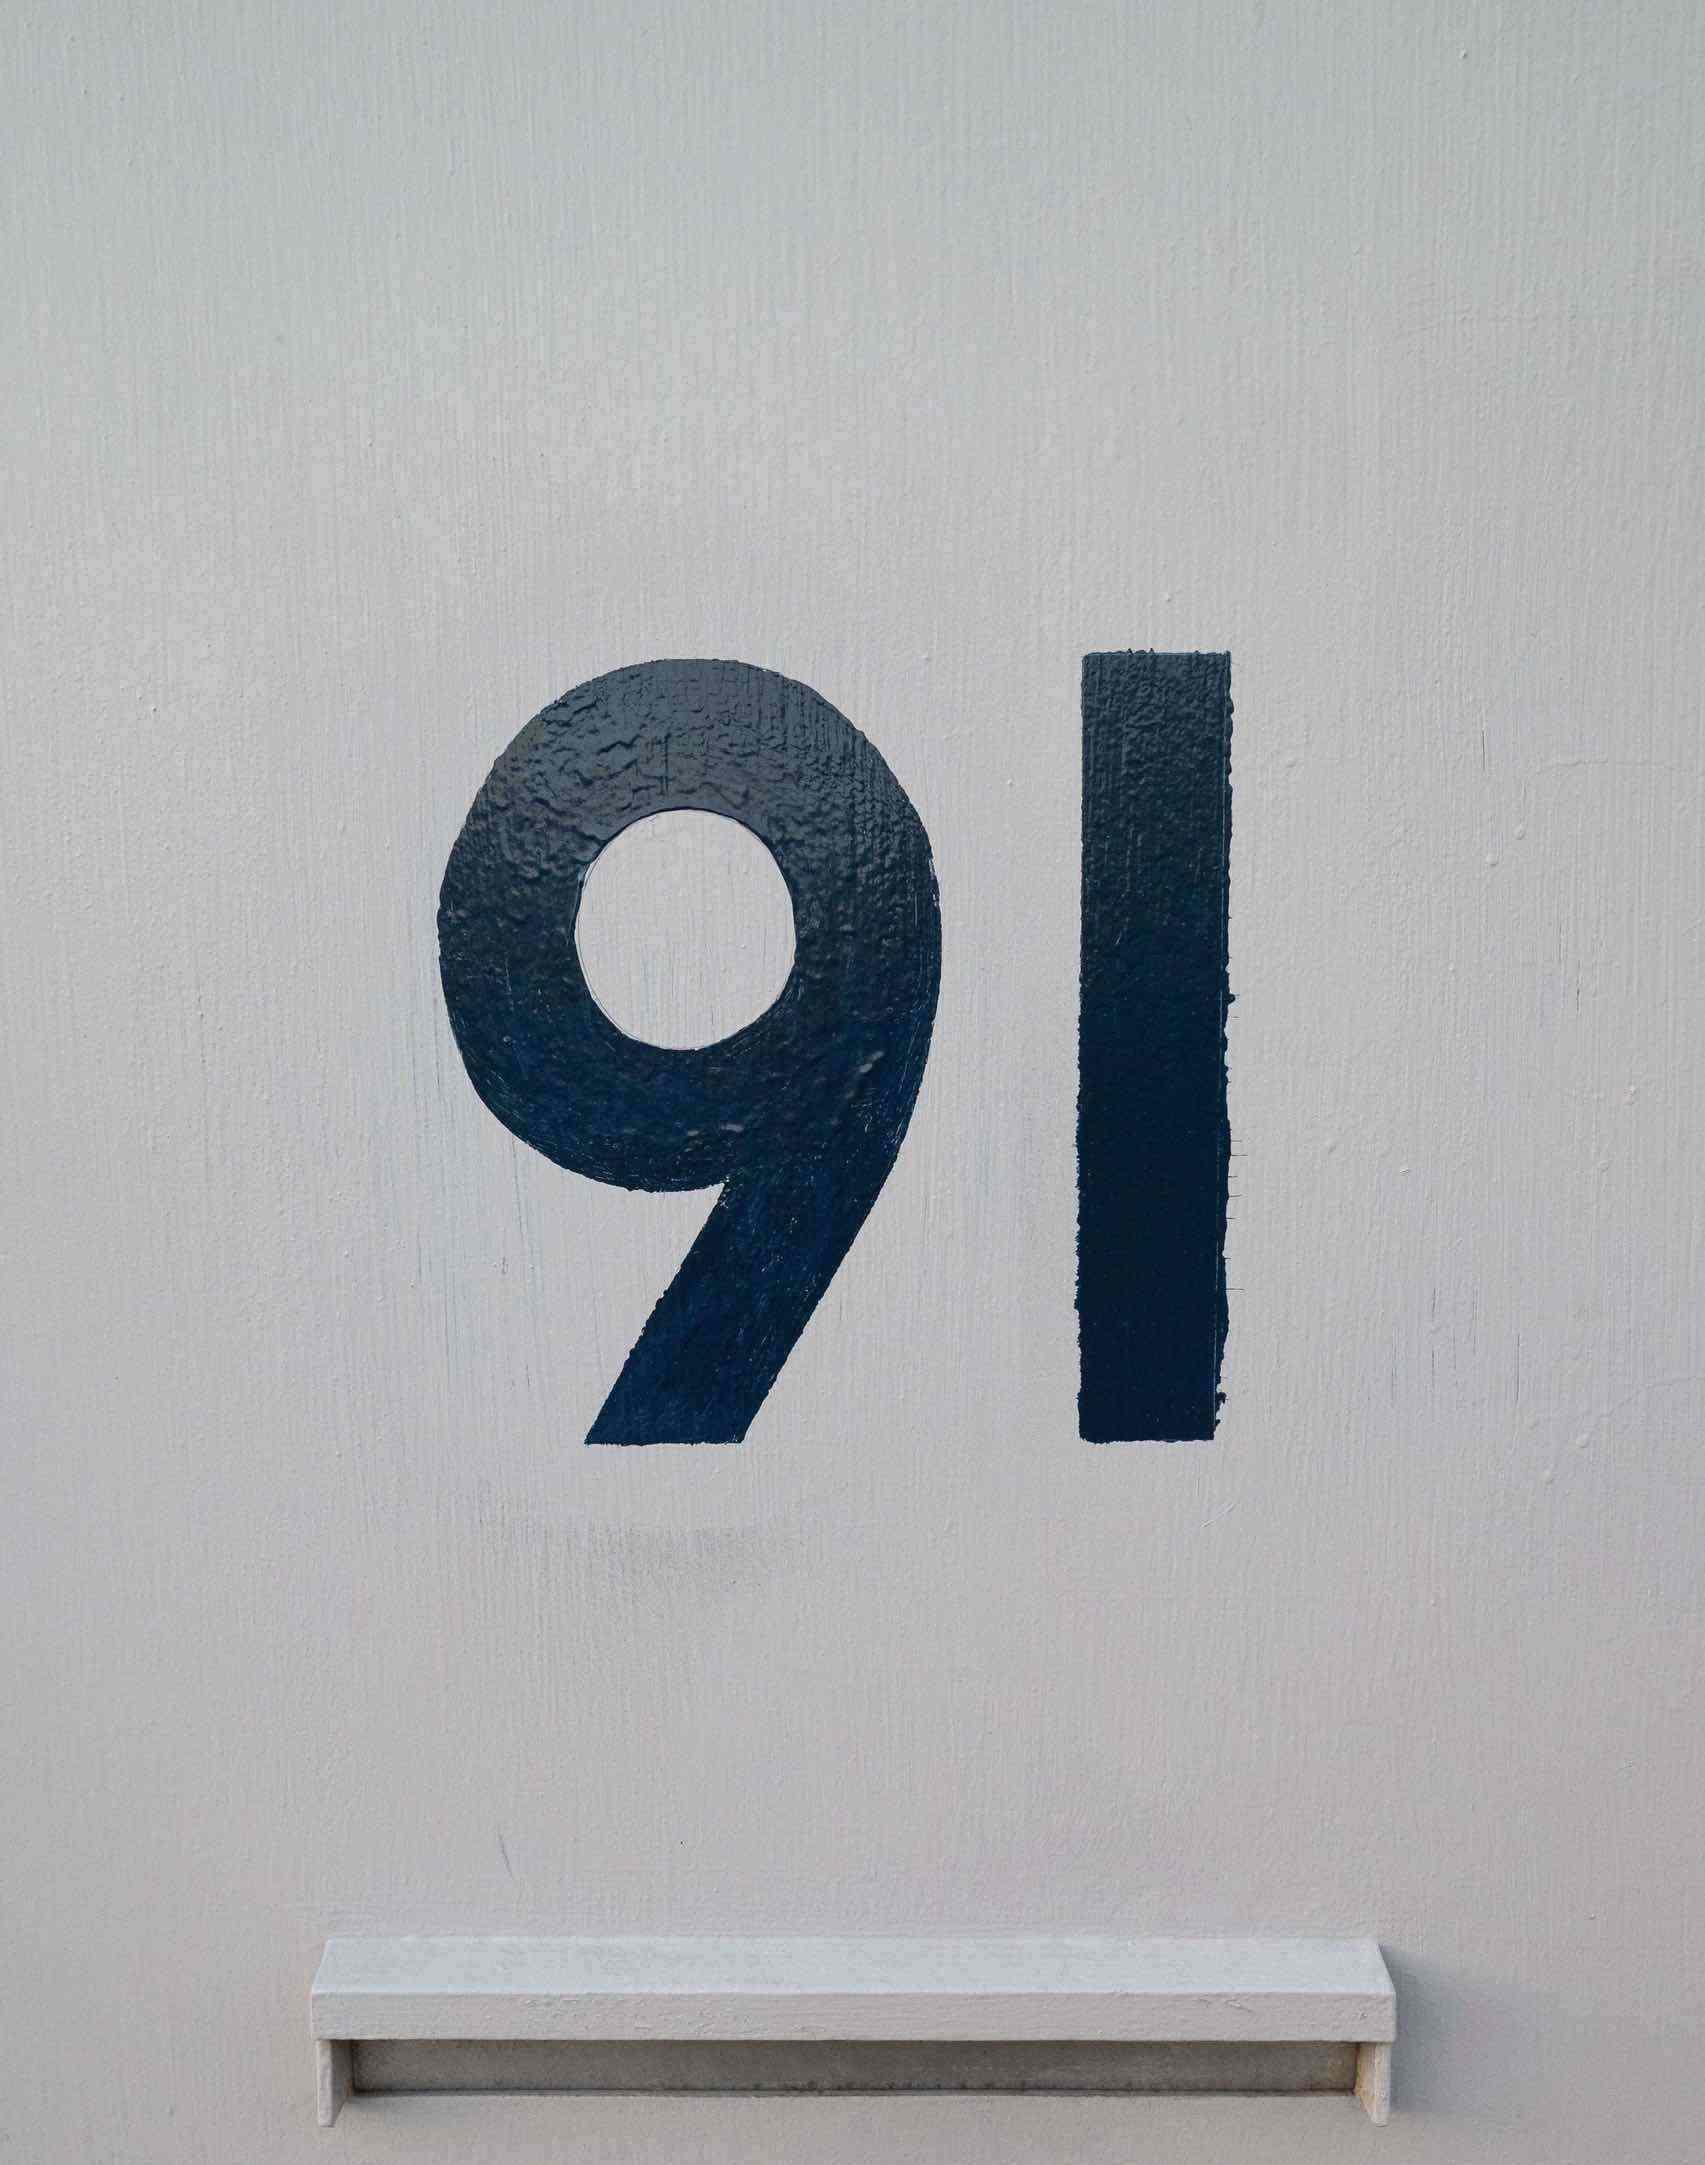 91 Zahl statt 90 Tagessätze